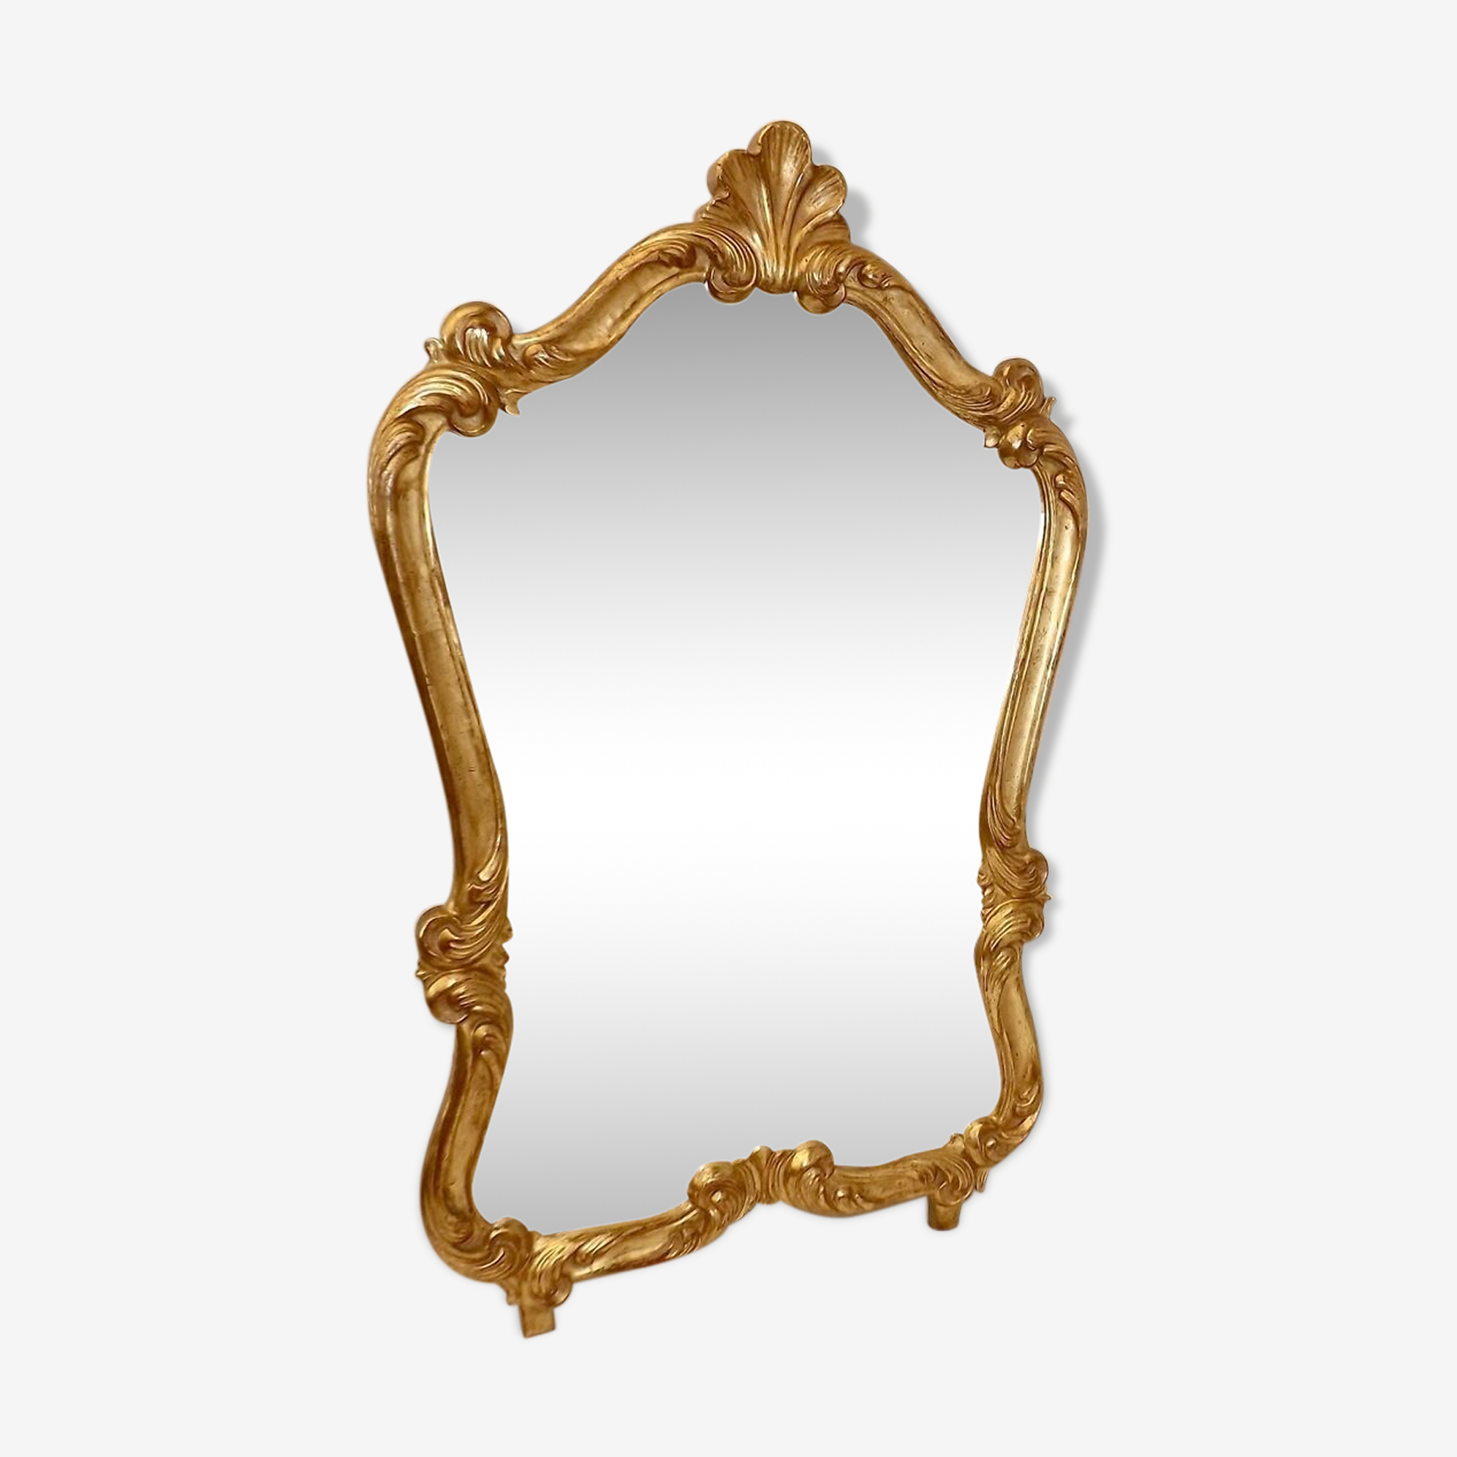 Mirror of style Louis XV 92x56cm